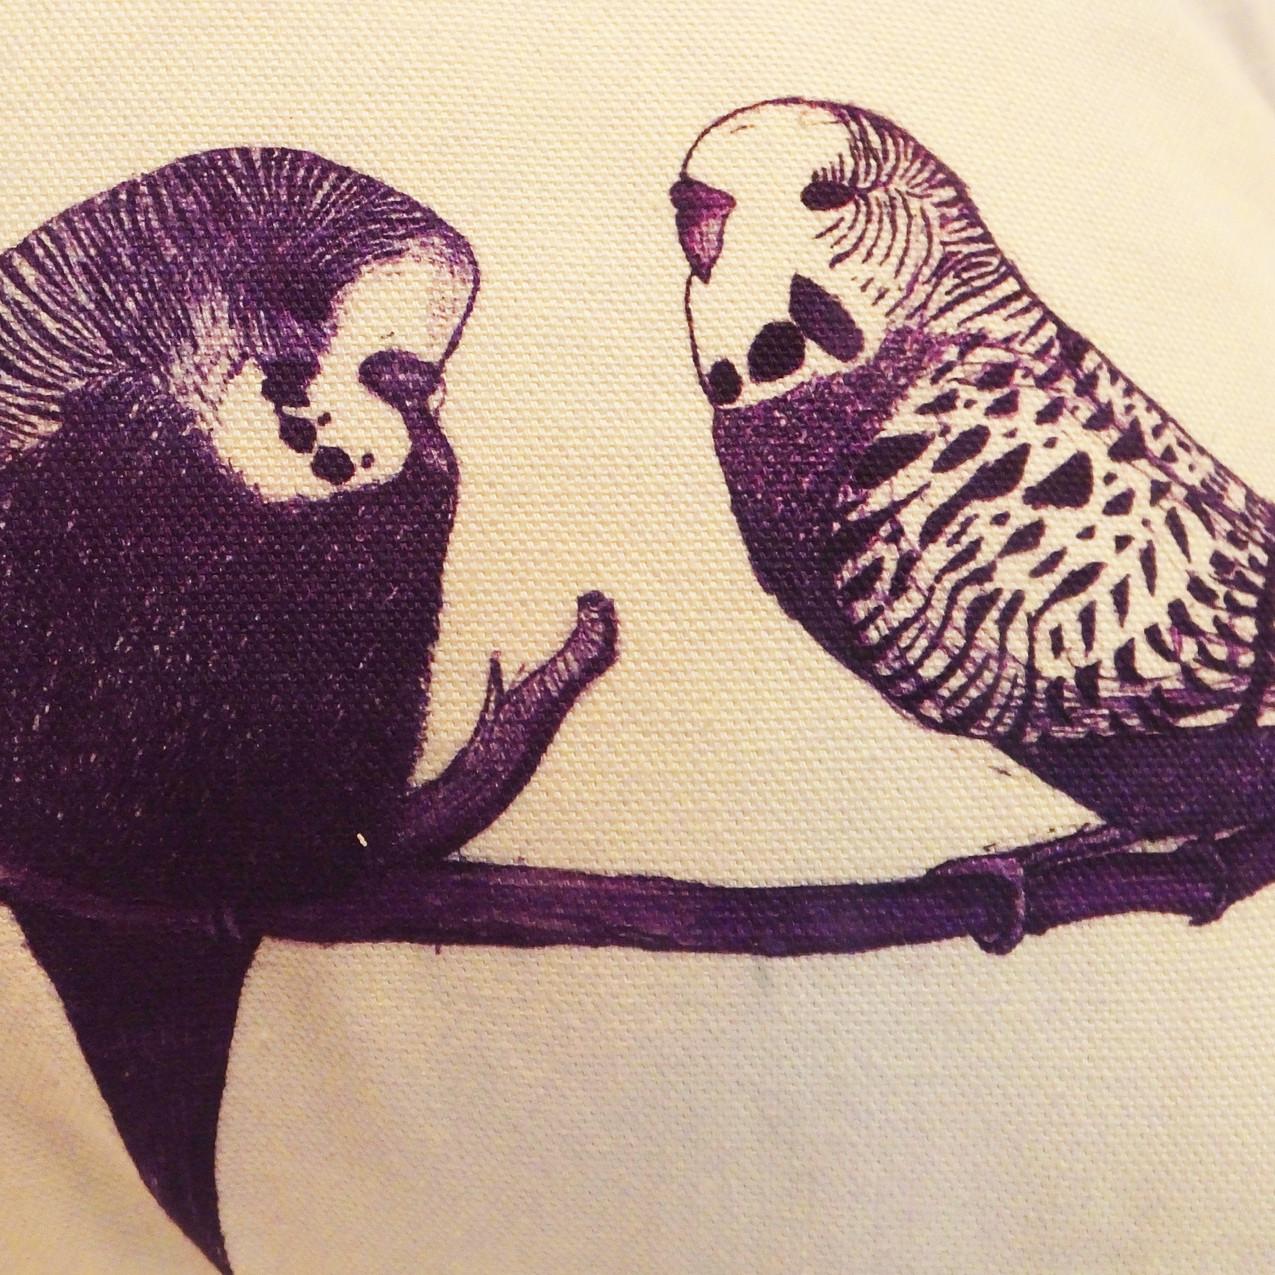 Jenny K Home Aviary Group Budgie Bird Cushion Purple Velvet Piping Cotton 4